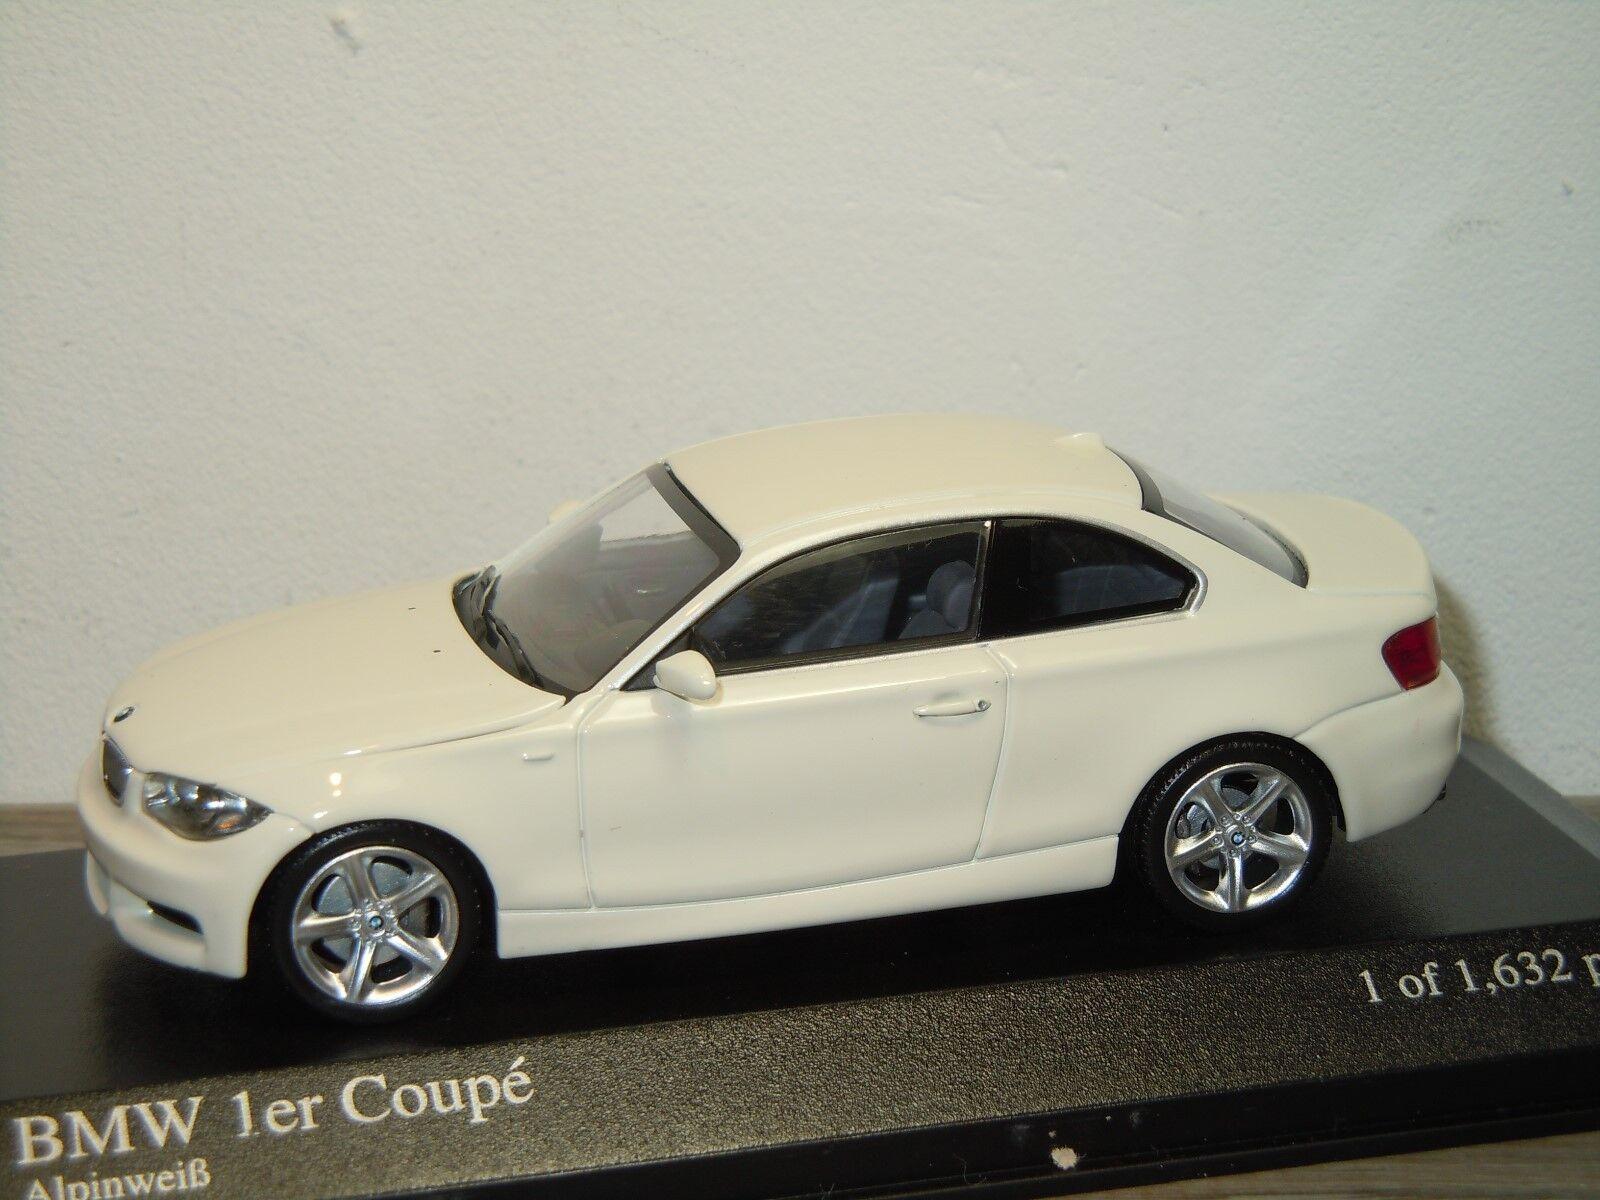 BMW  1 Series Coupe 2007 - Minichamps 1 43 in Box 34914  sortie